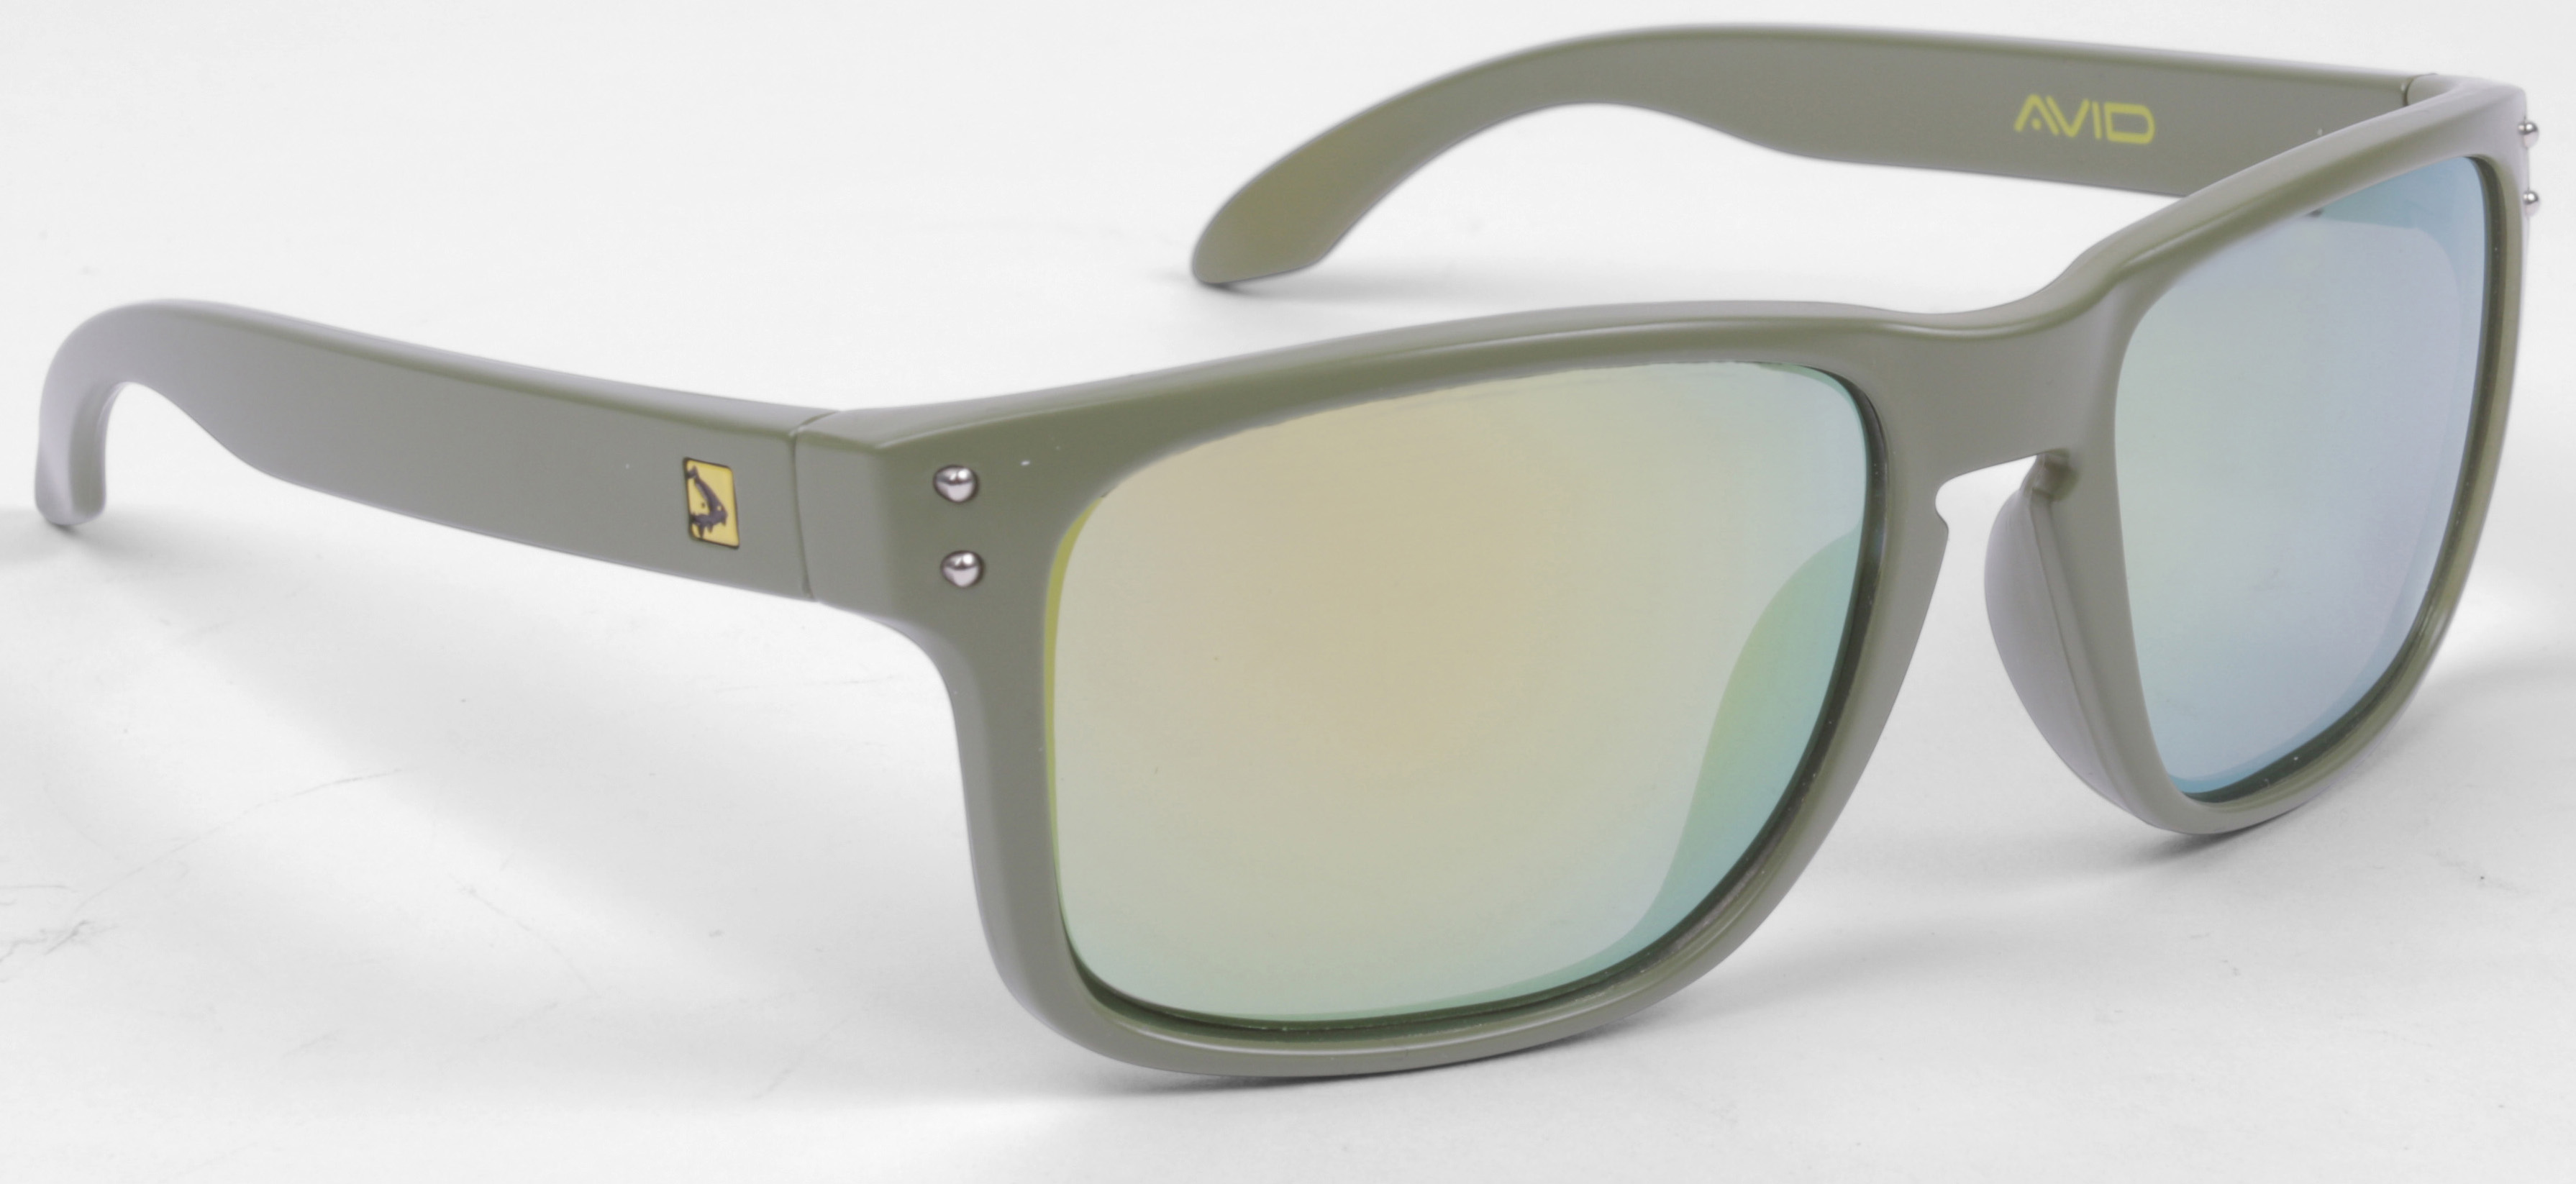 e5bdca6c752 Avid Carp Polarised Sunglasses - Sage - Green Revo Lens – Glasgow ...